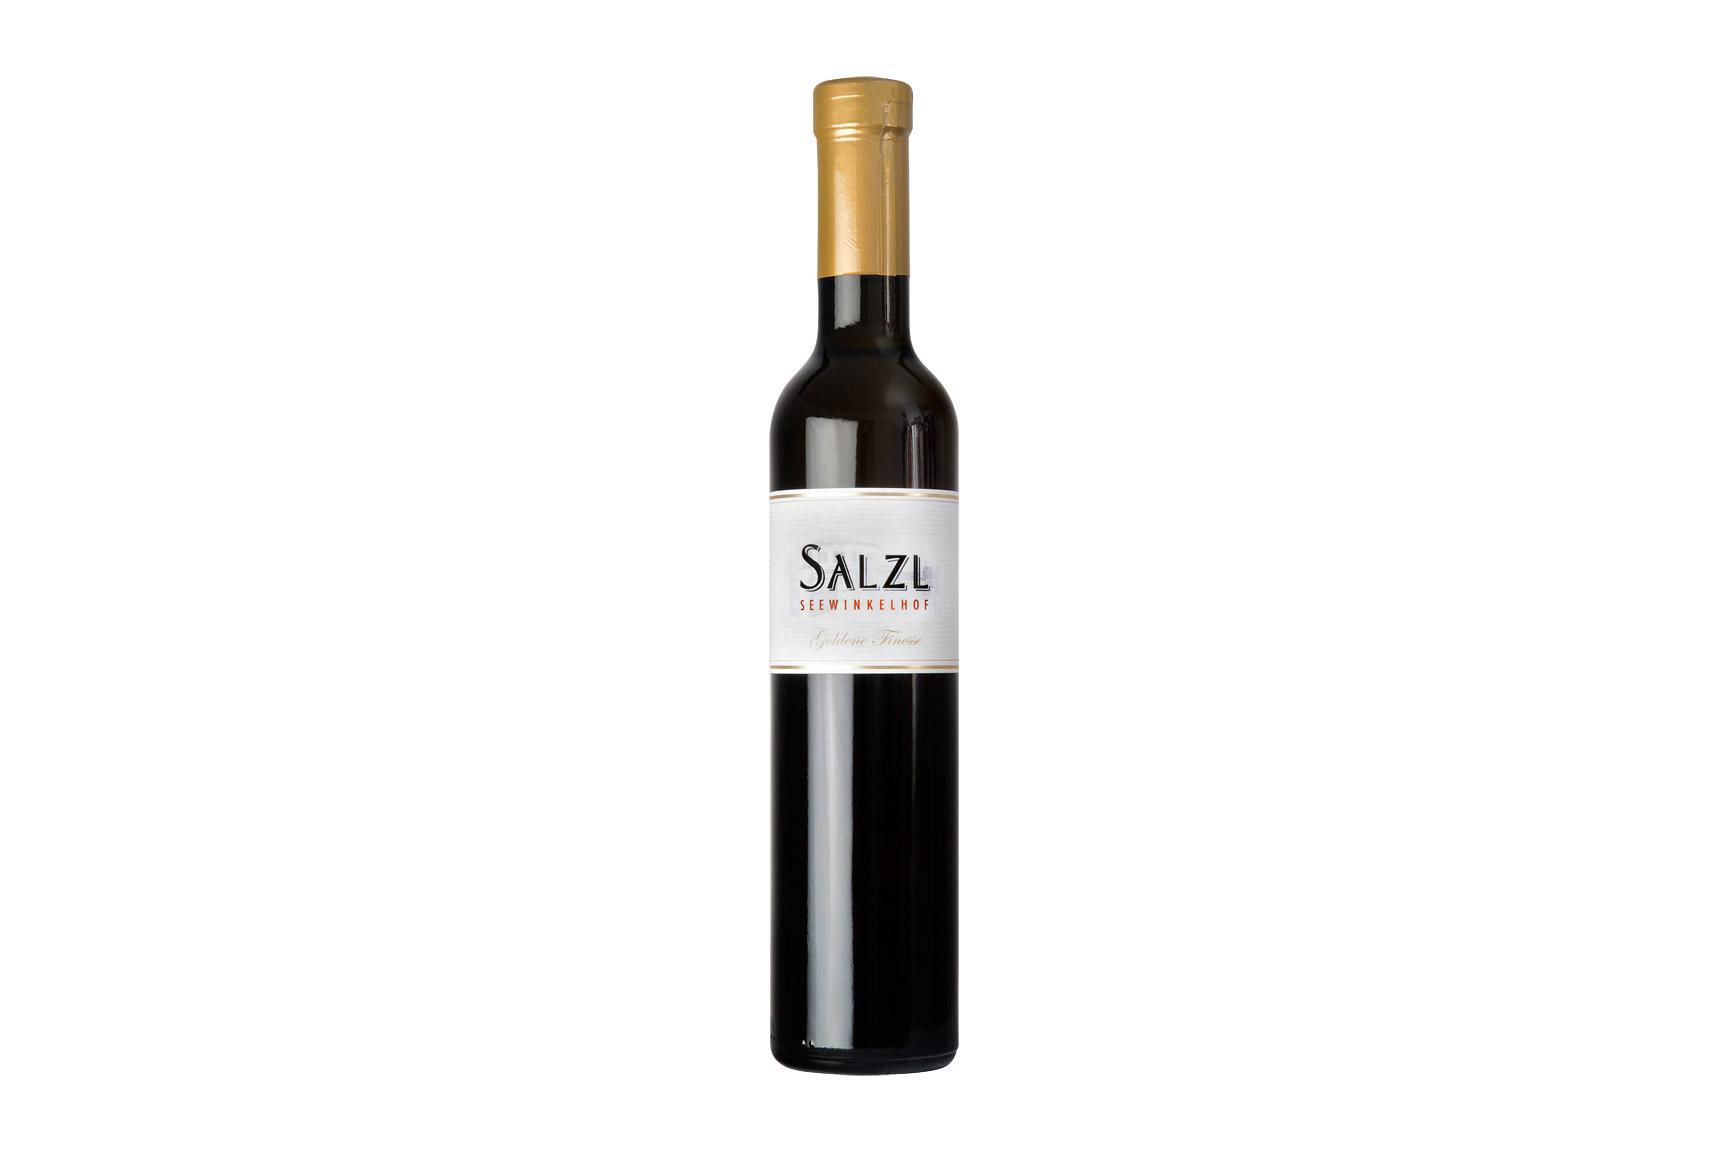 Salzl, Goldene Finesse, 2015, vin alb dulce, AWine